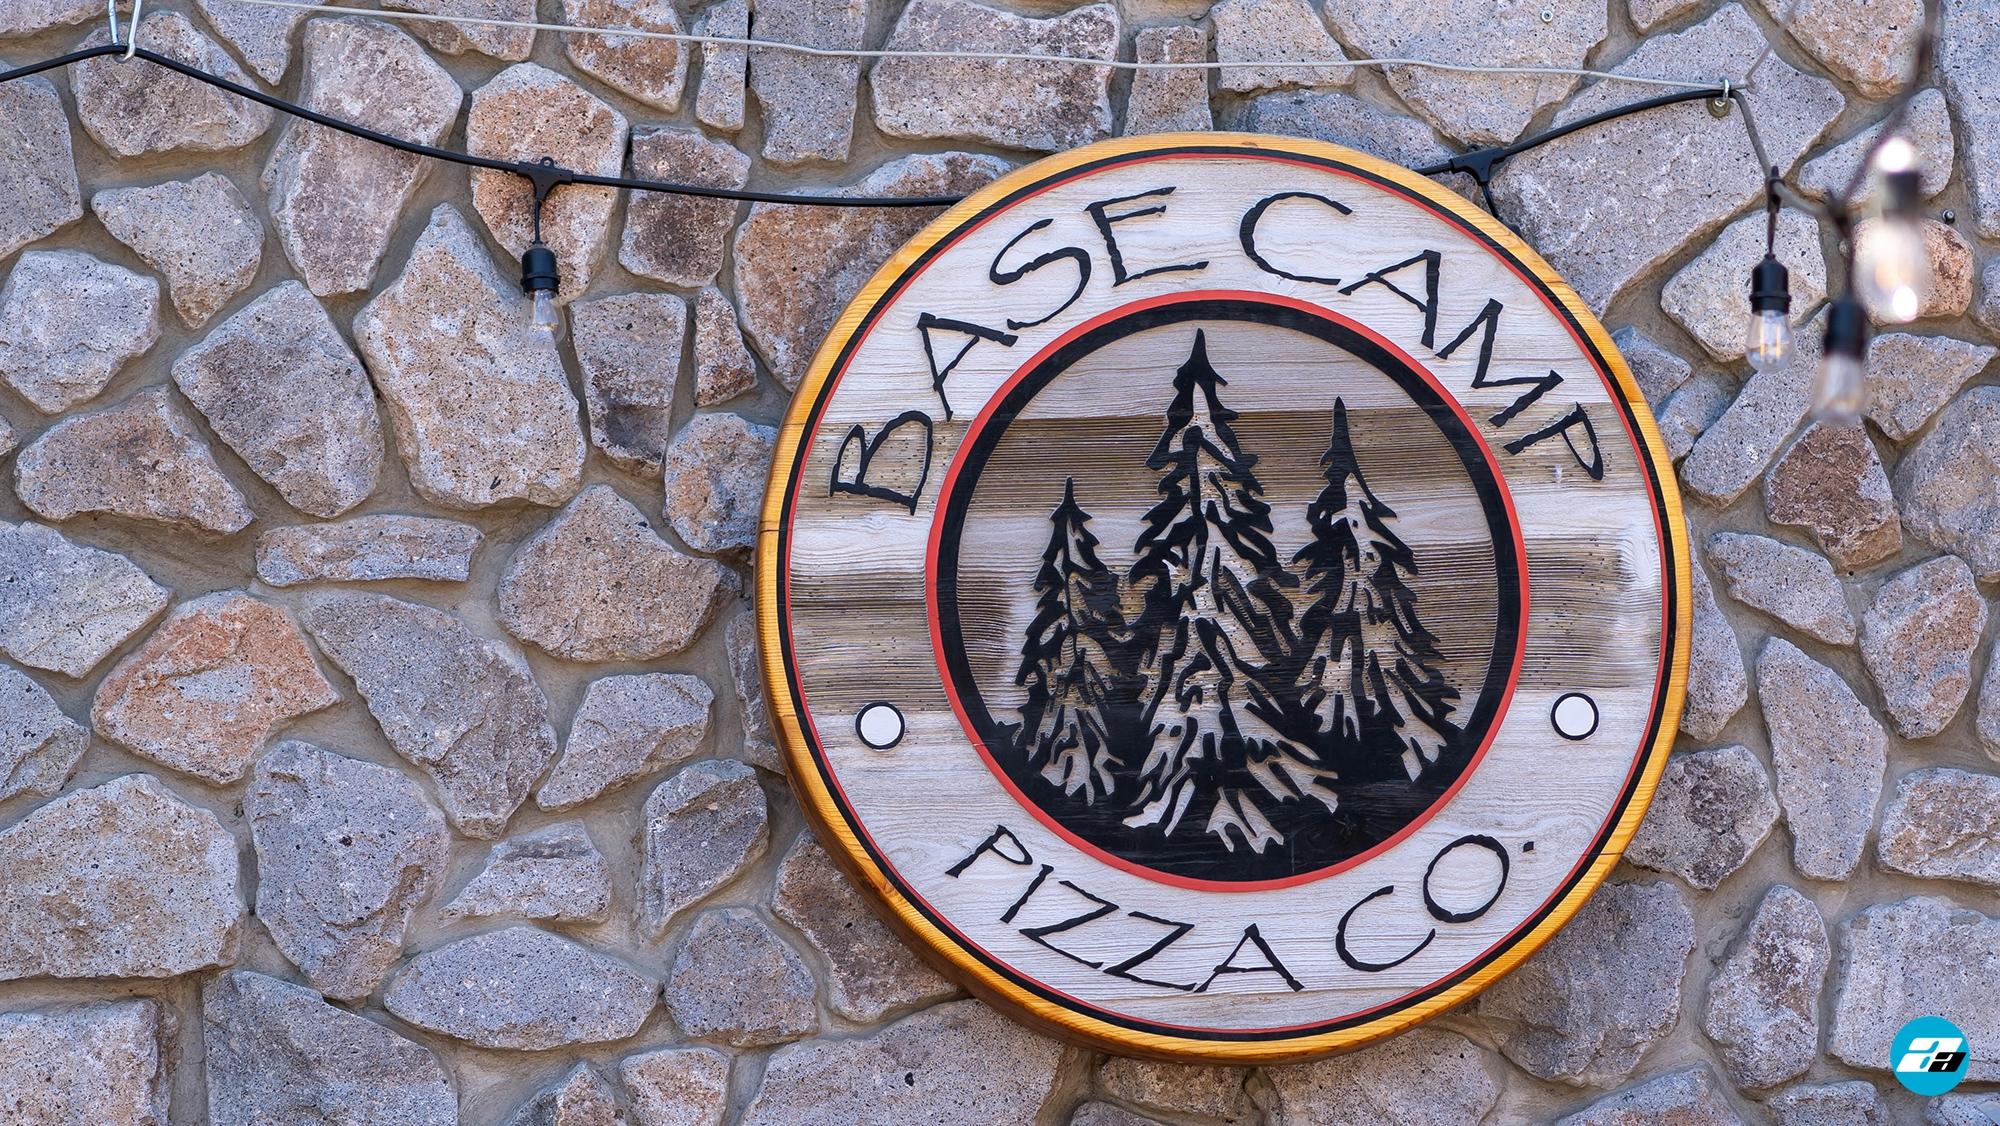 Base Camp Pizza, Lake Tahoe, CA